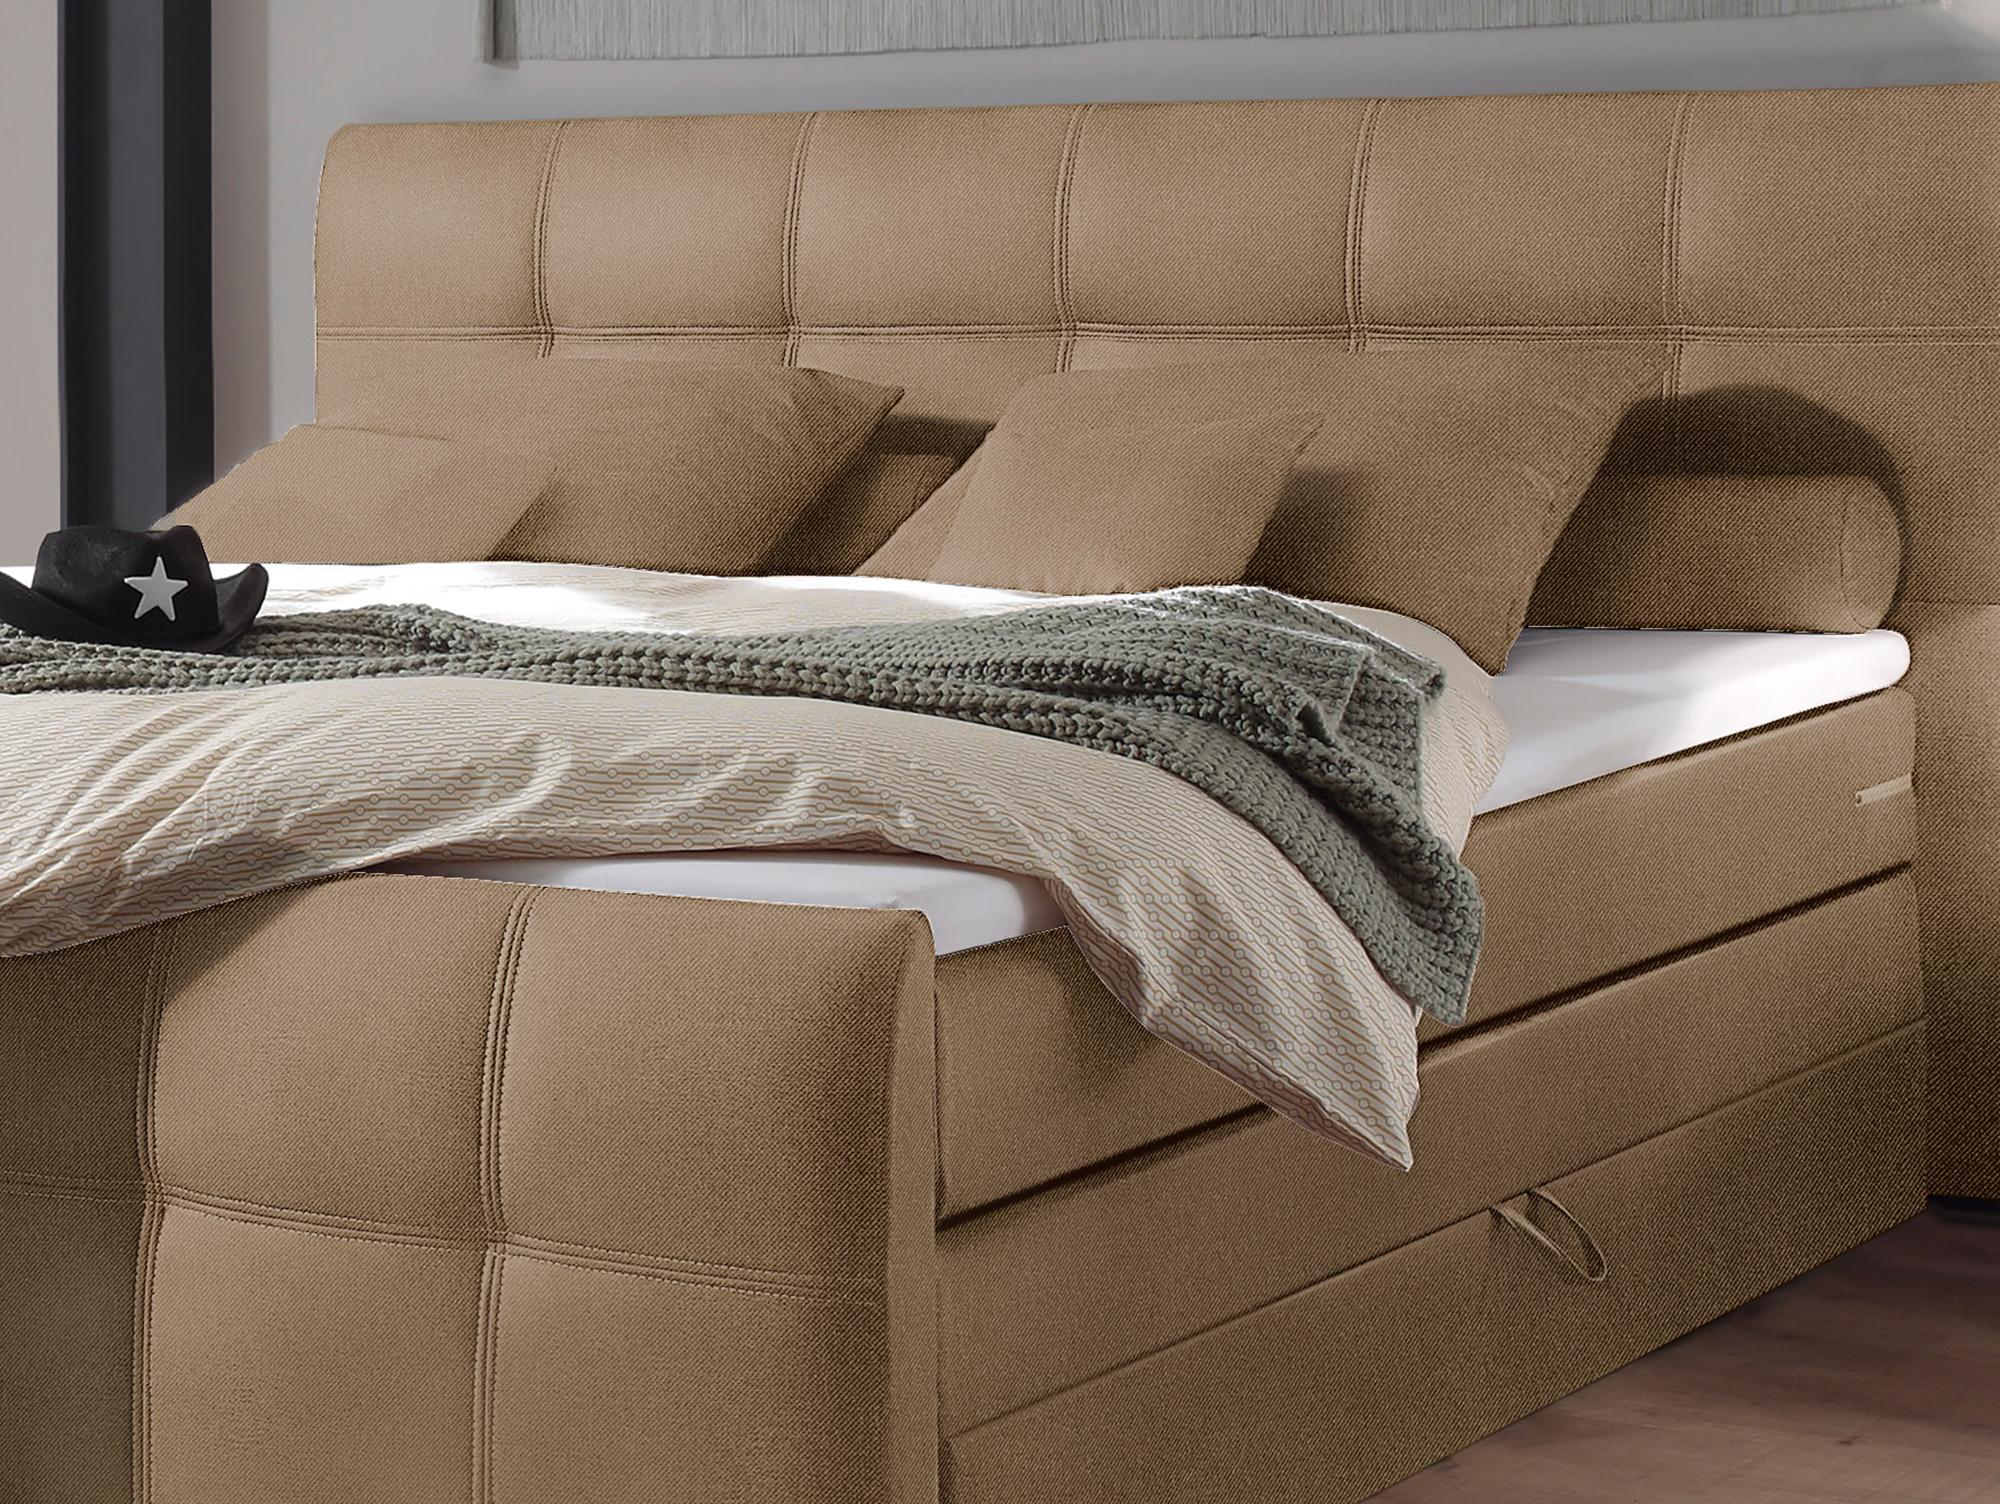 kissen set 6 teilig bezug web inari sand. Black Bedroom Furniture Sets. Home Design Ideas